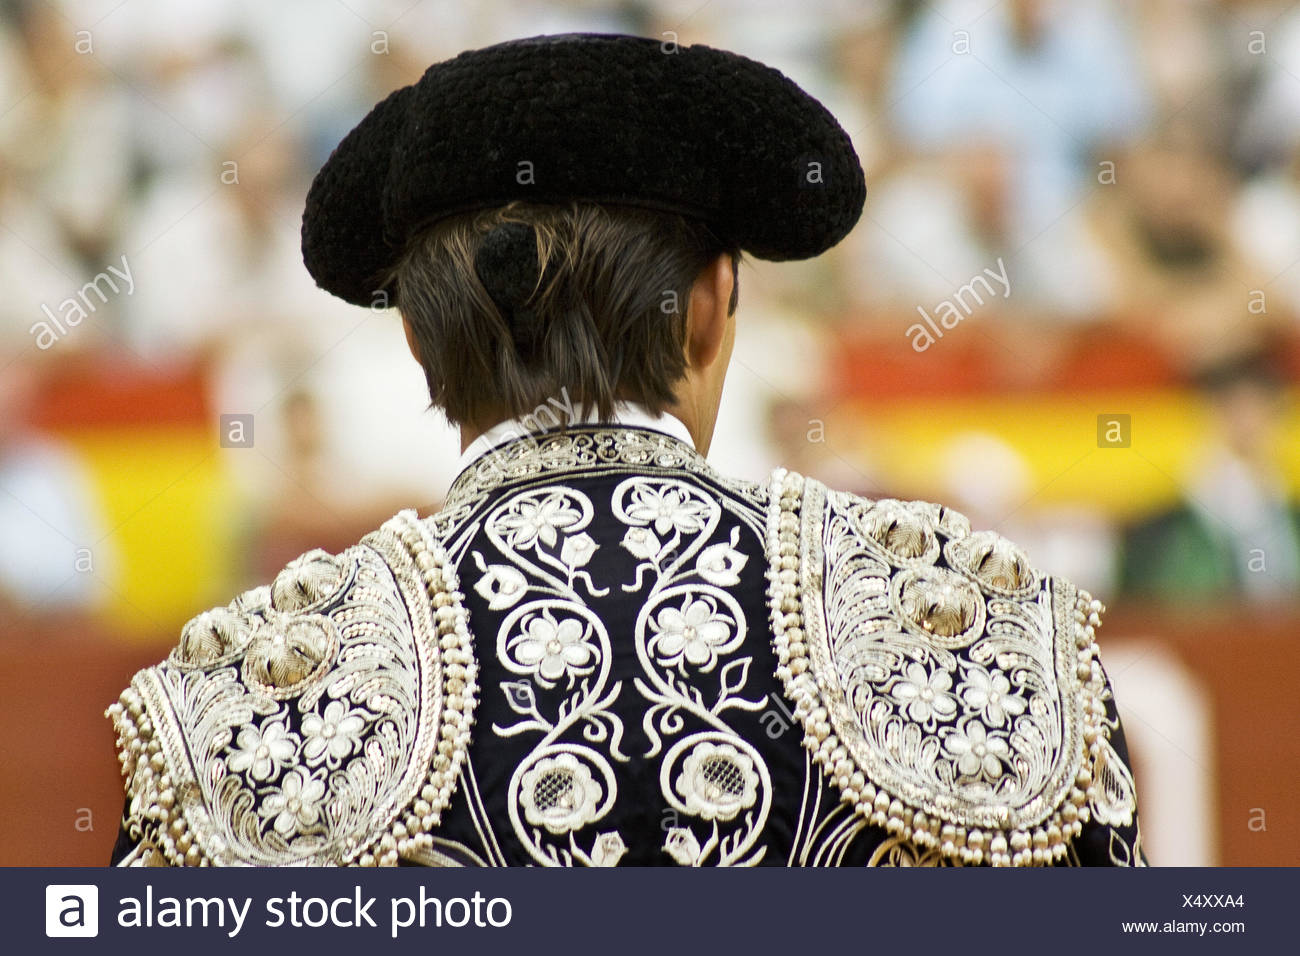 Bullfighter Hat Stock Photos   Bullfighter Hat Stock Images - Alamy ec578a76da8